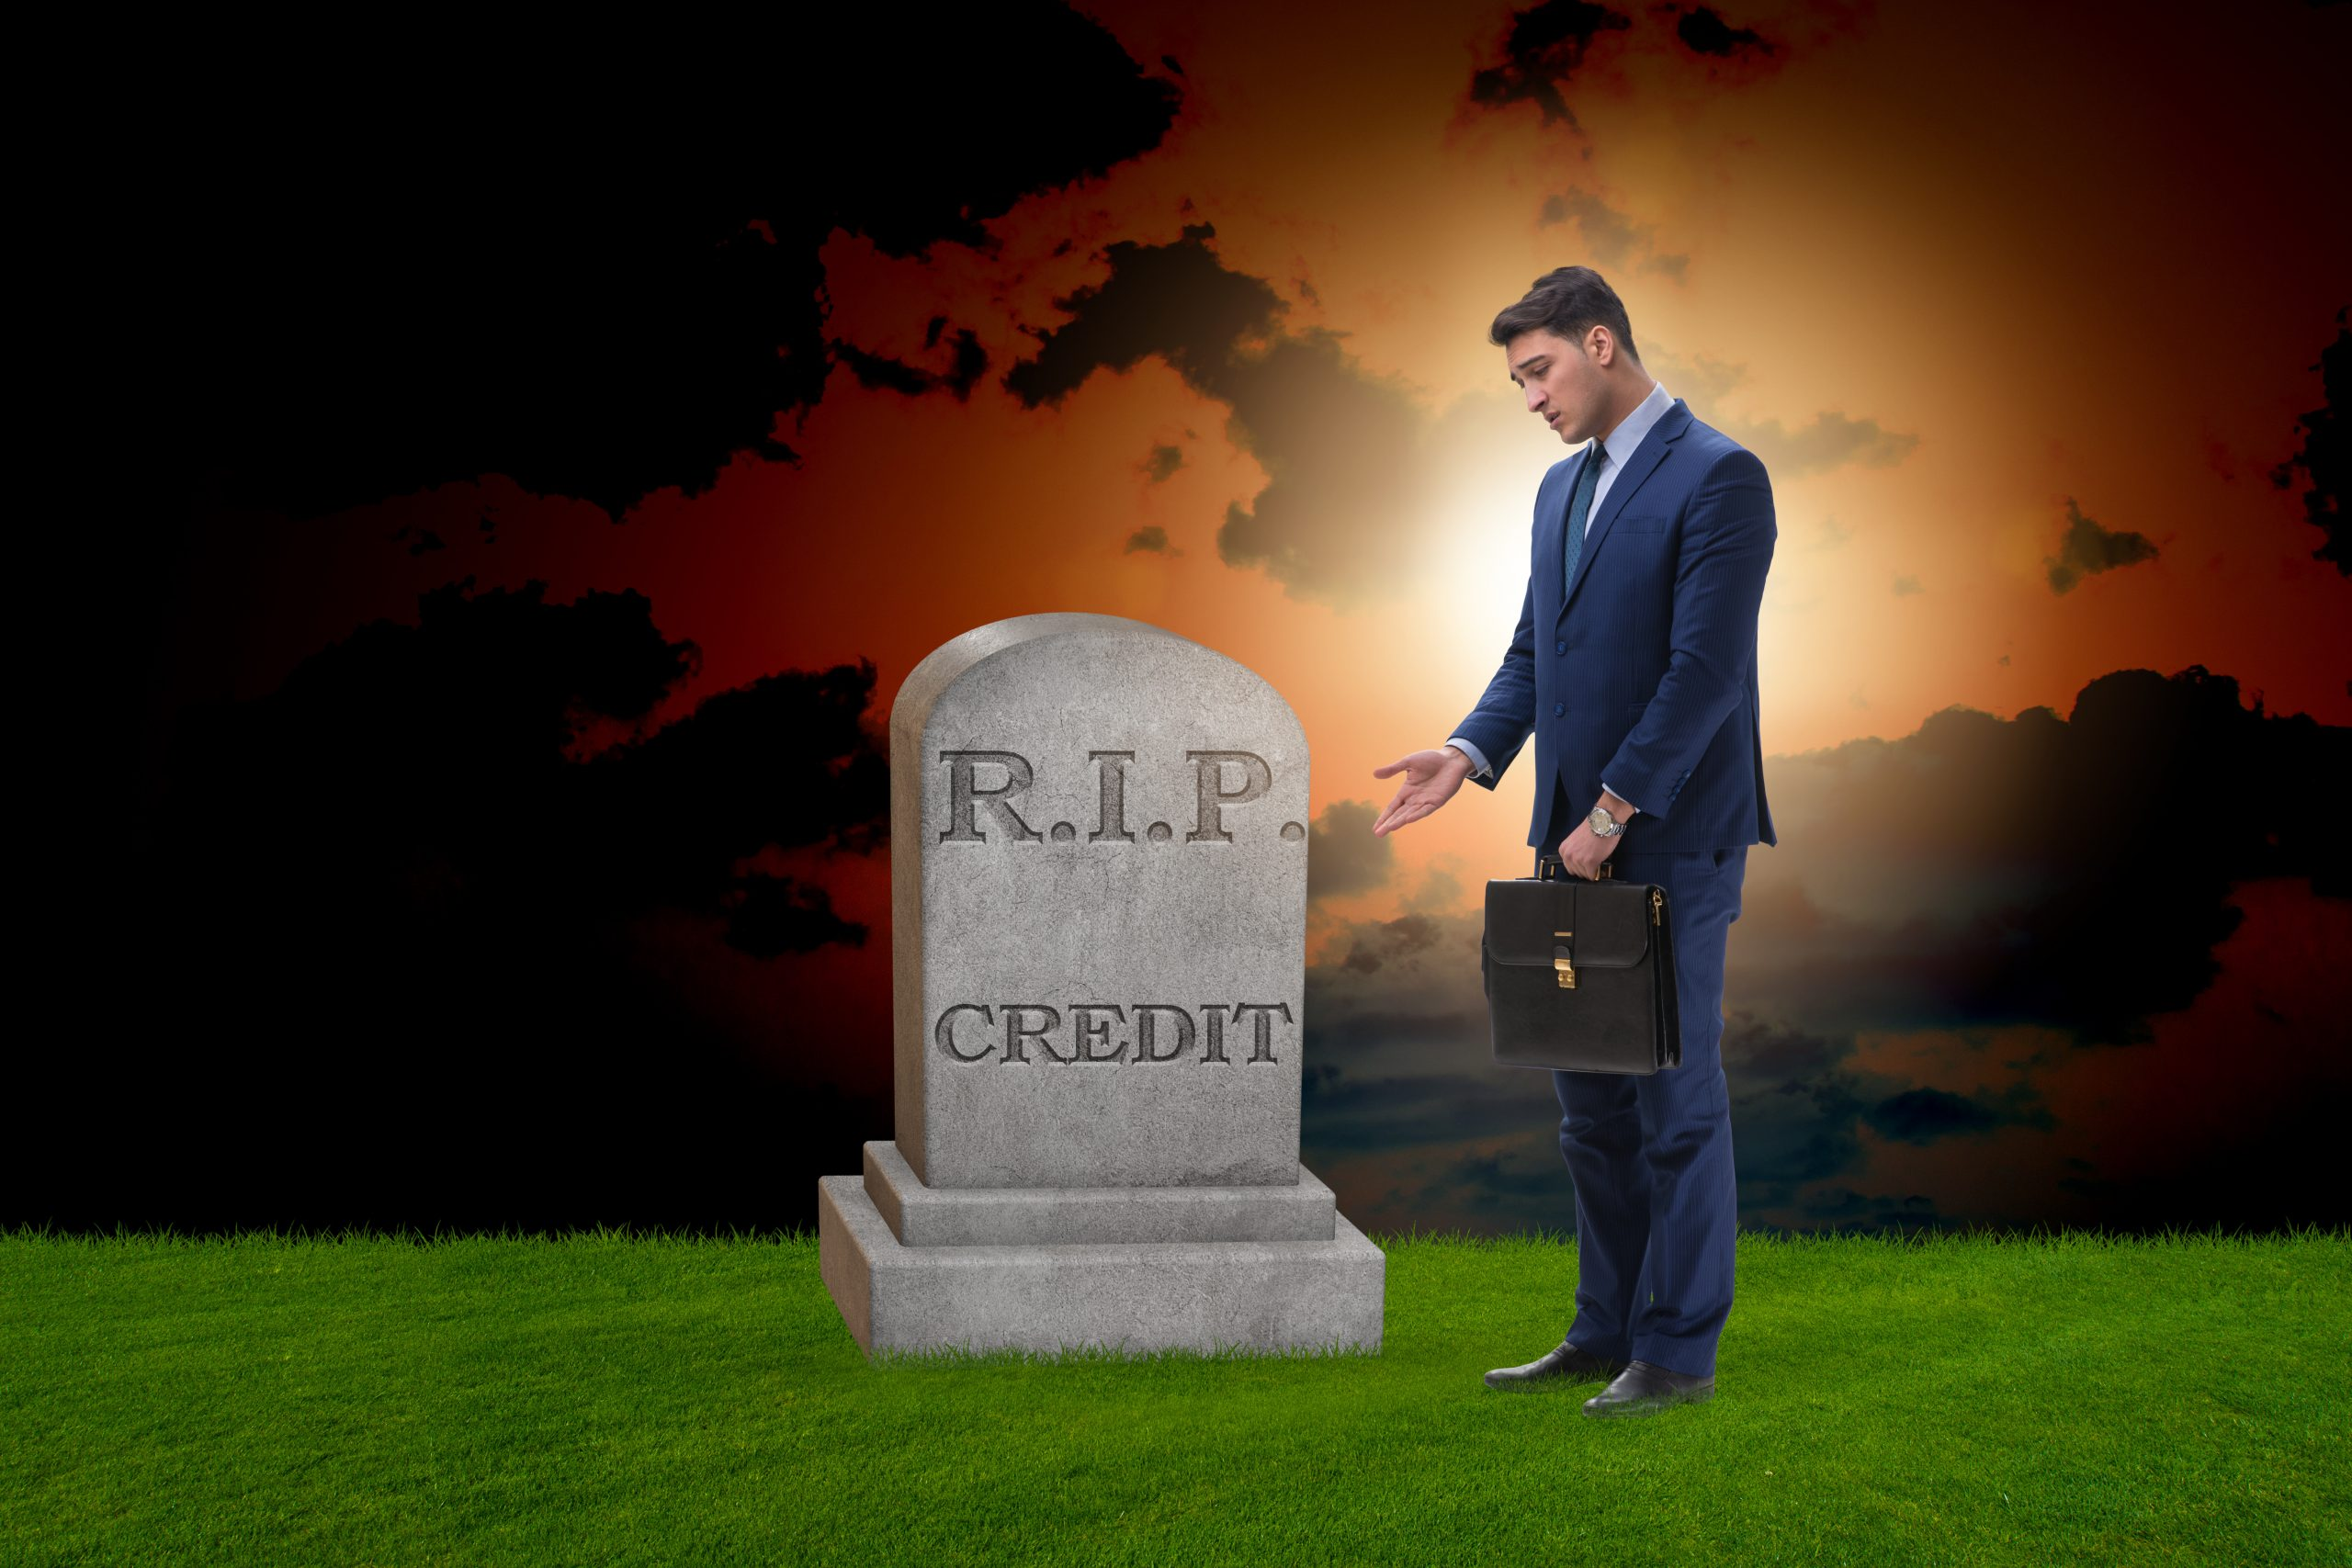 7 facons tuer cote de credit